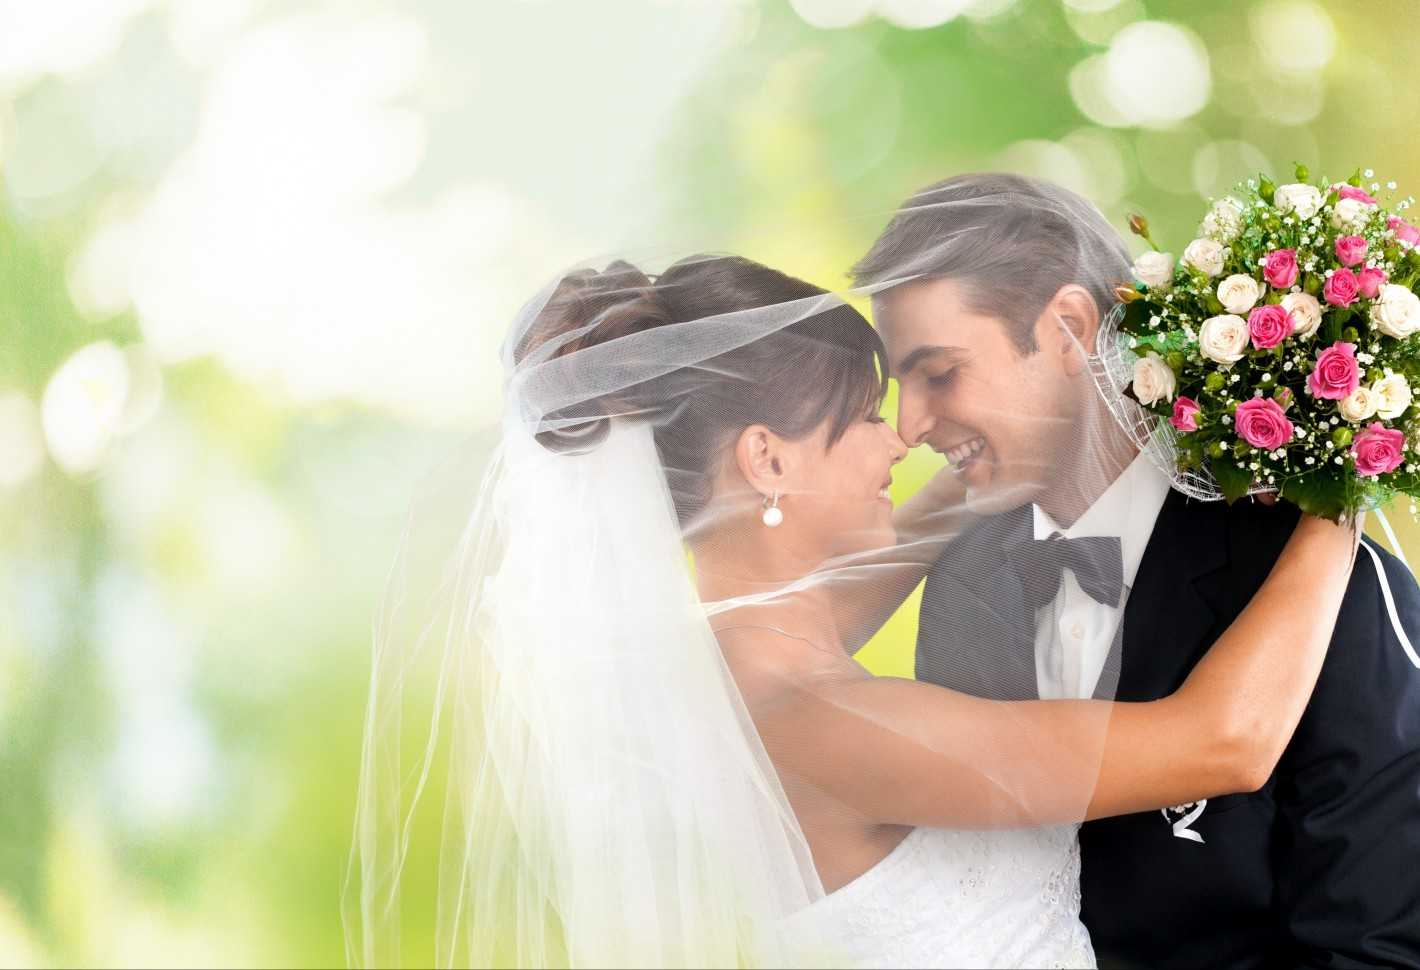 Изображение - Поздравления молодоженам на свадьбу от друзей Molodije